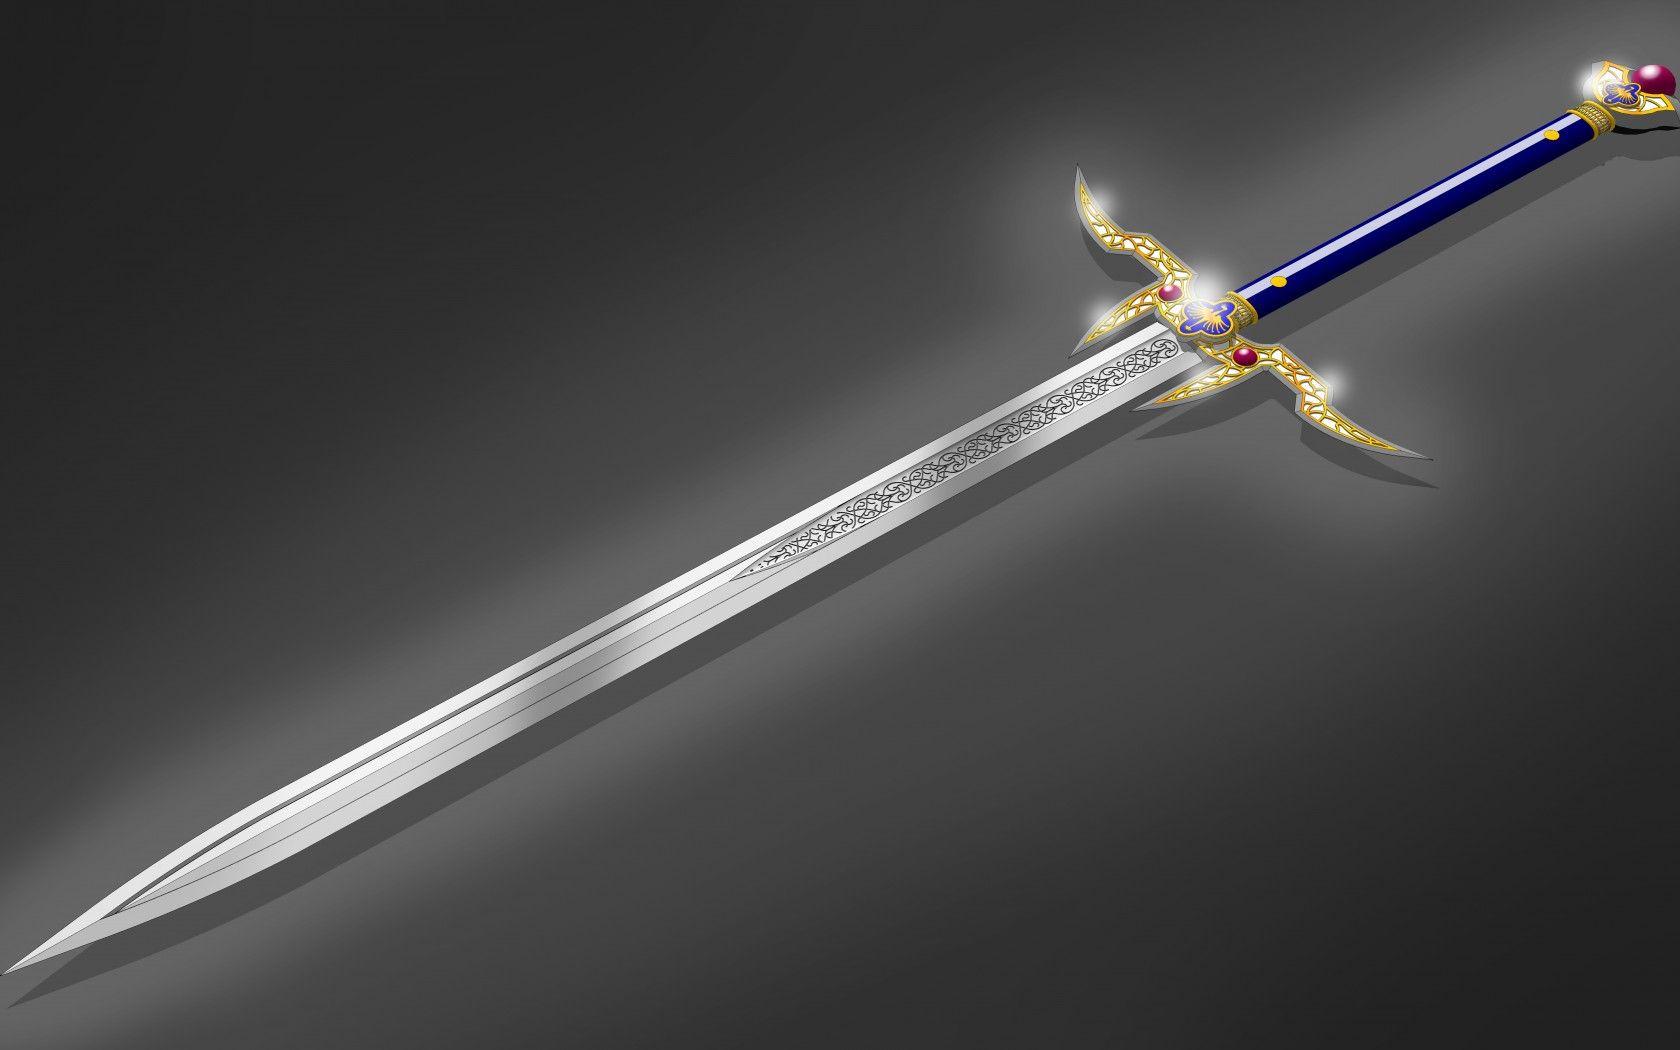 sword images free download